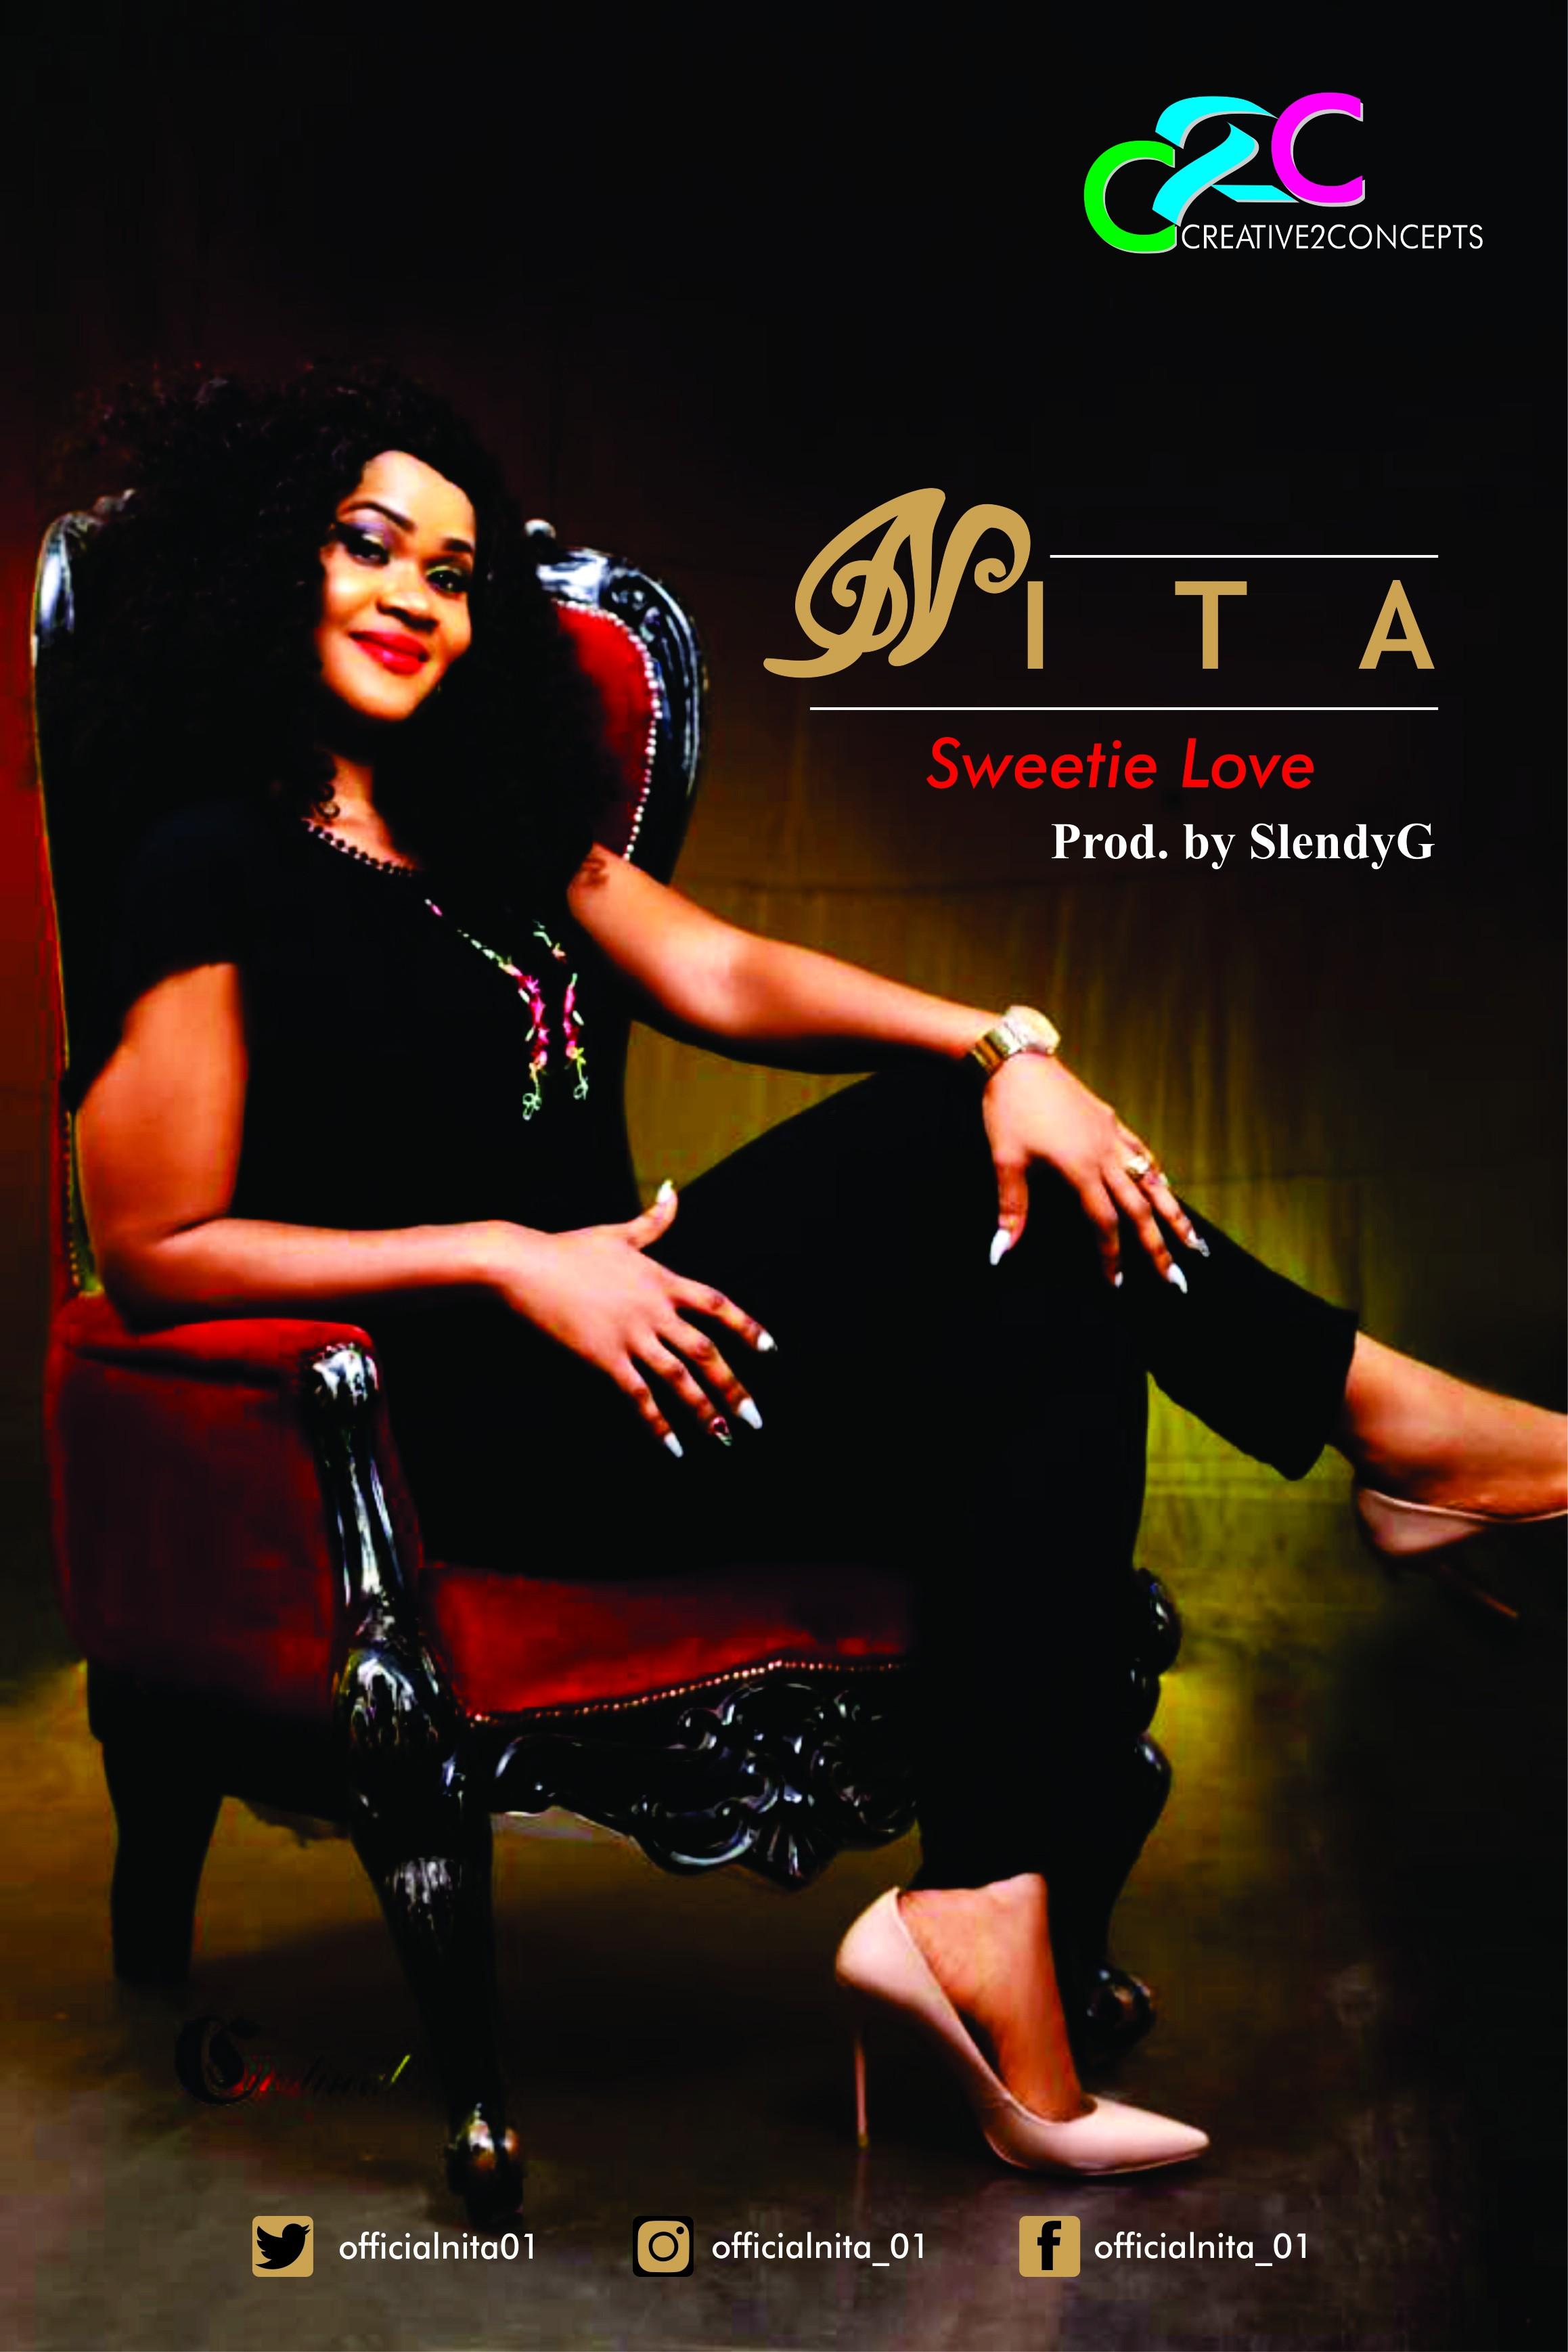 Nita Sweetie Love Download